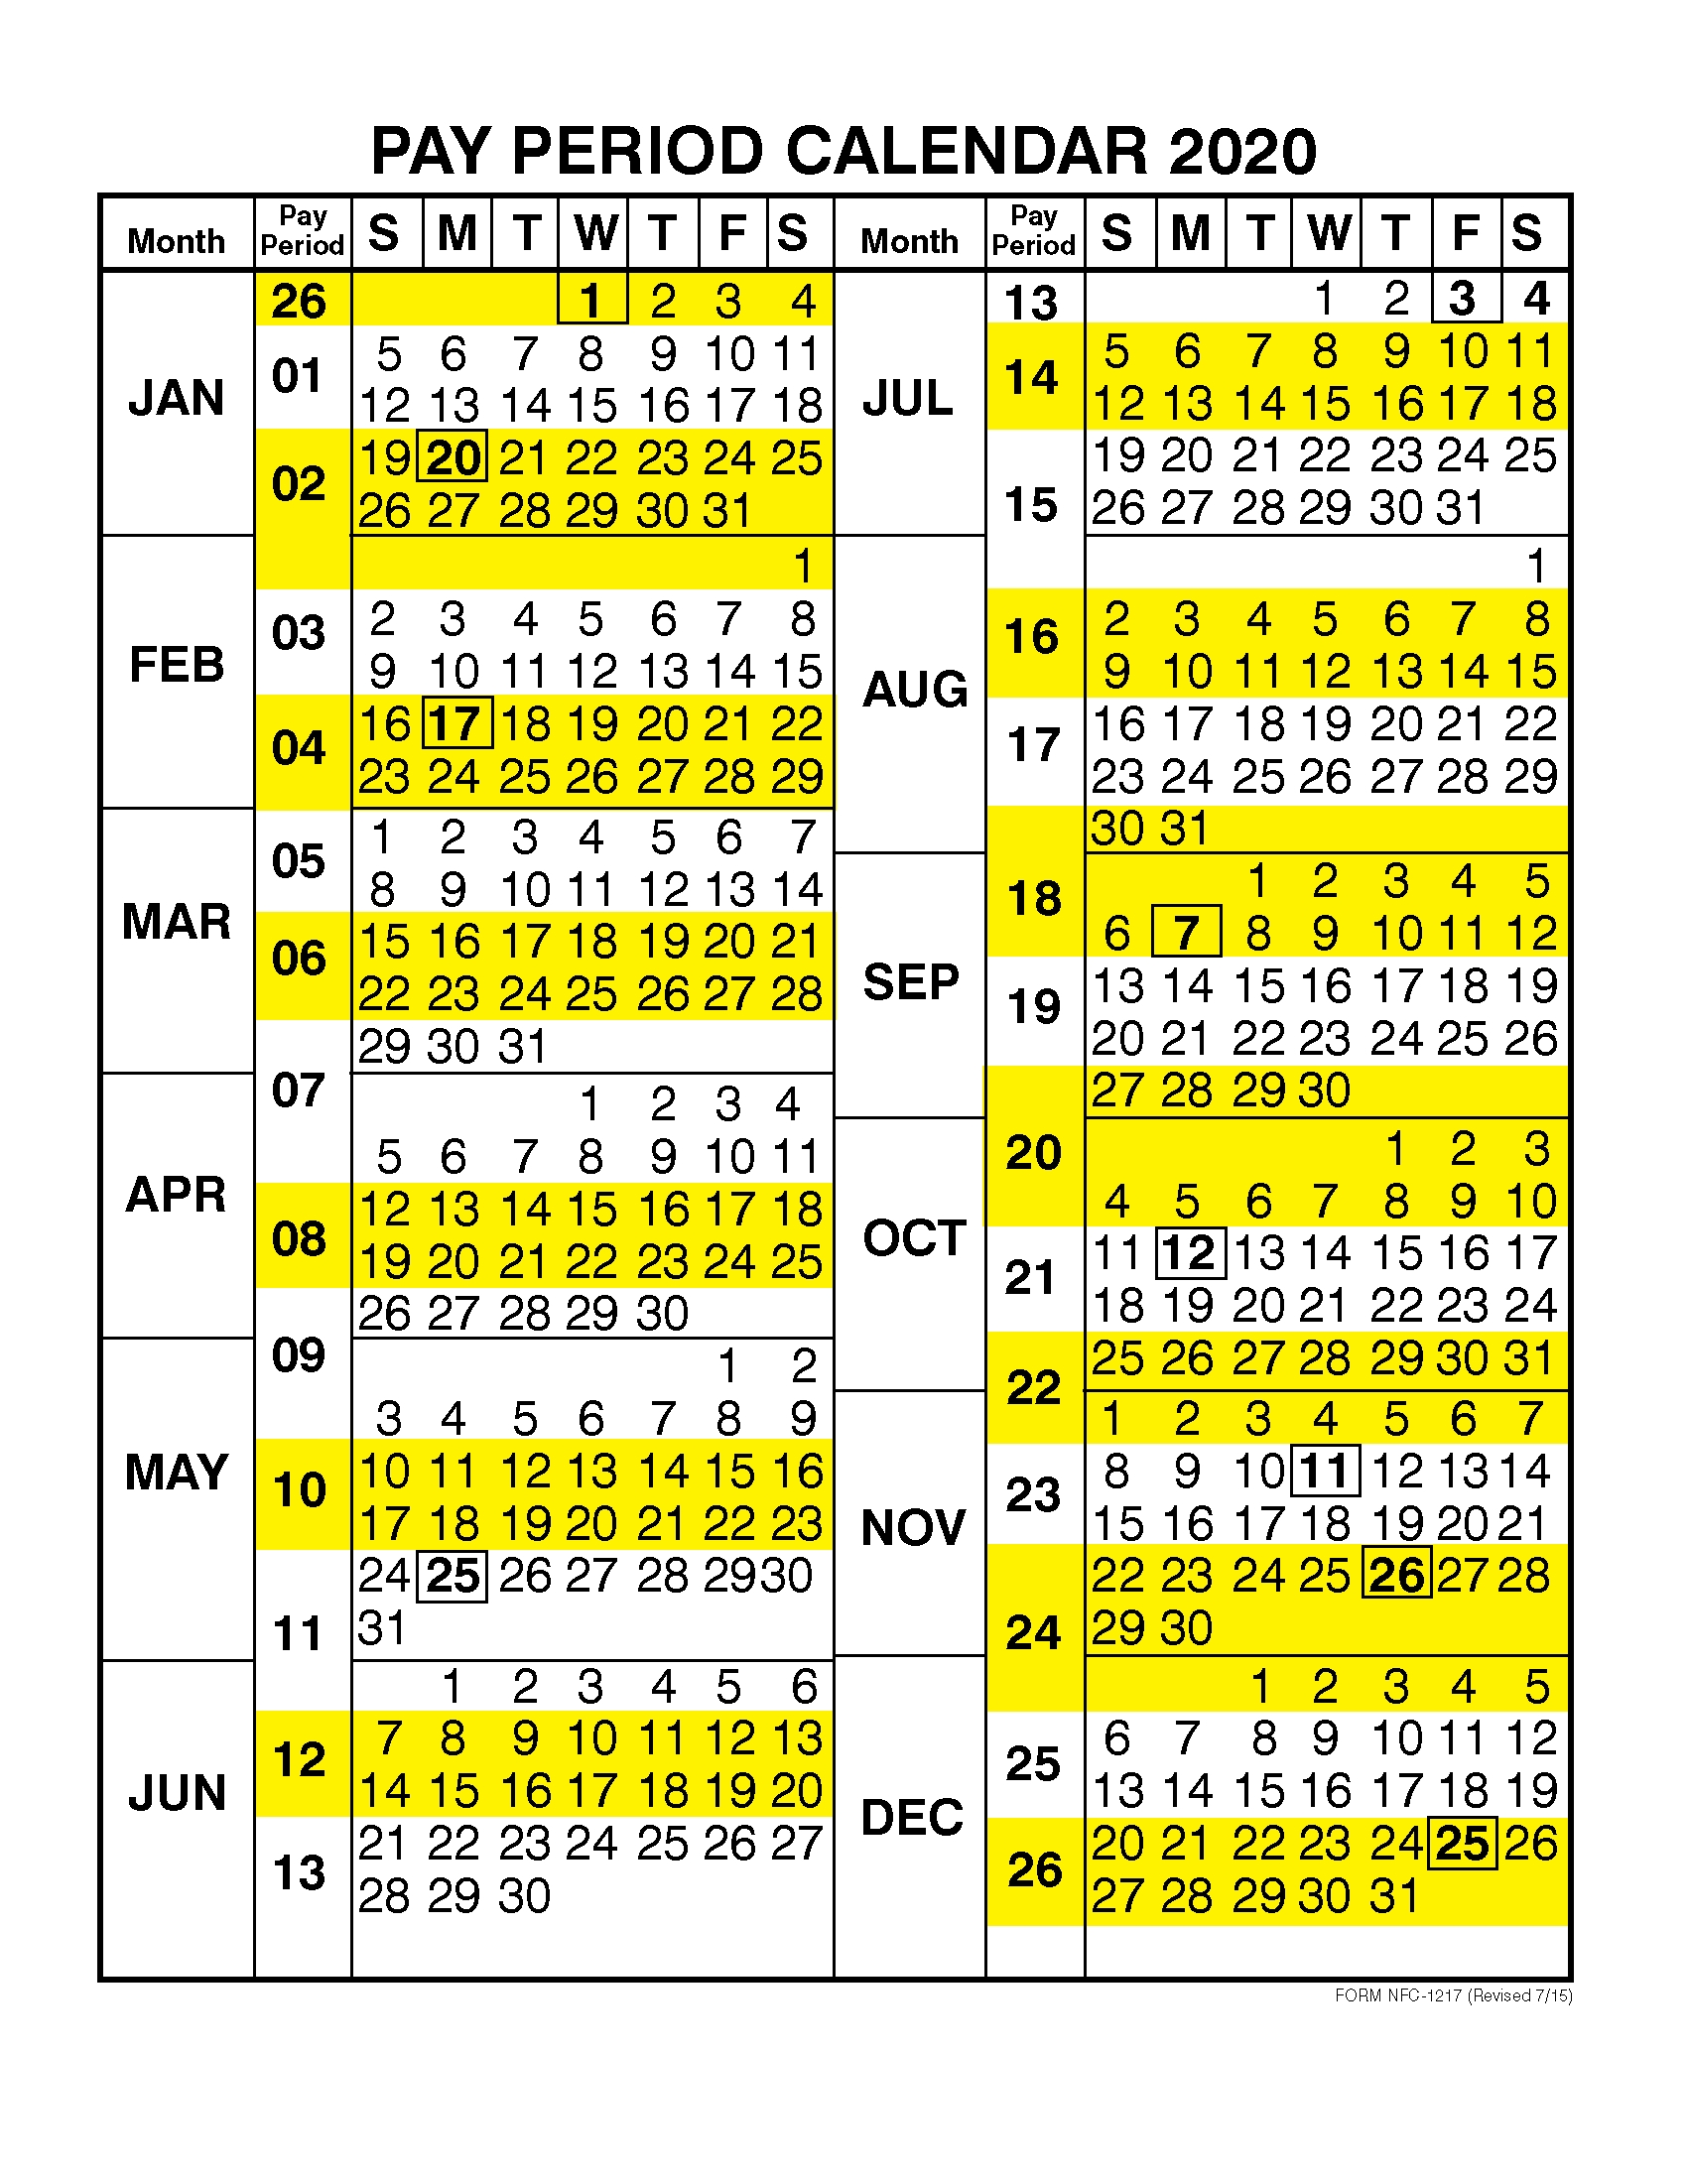 Csus Payroll Calendar 2021 | 2021 Pay Periods Calendar